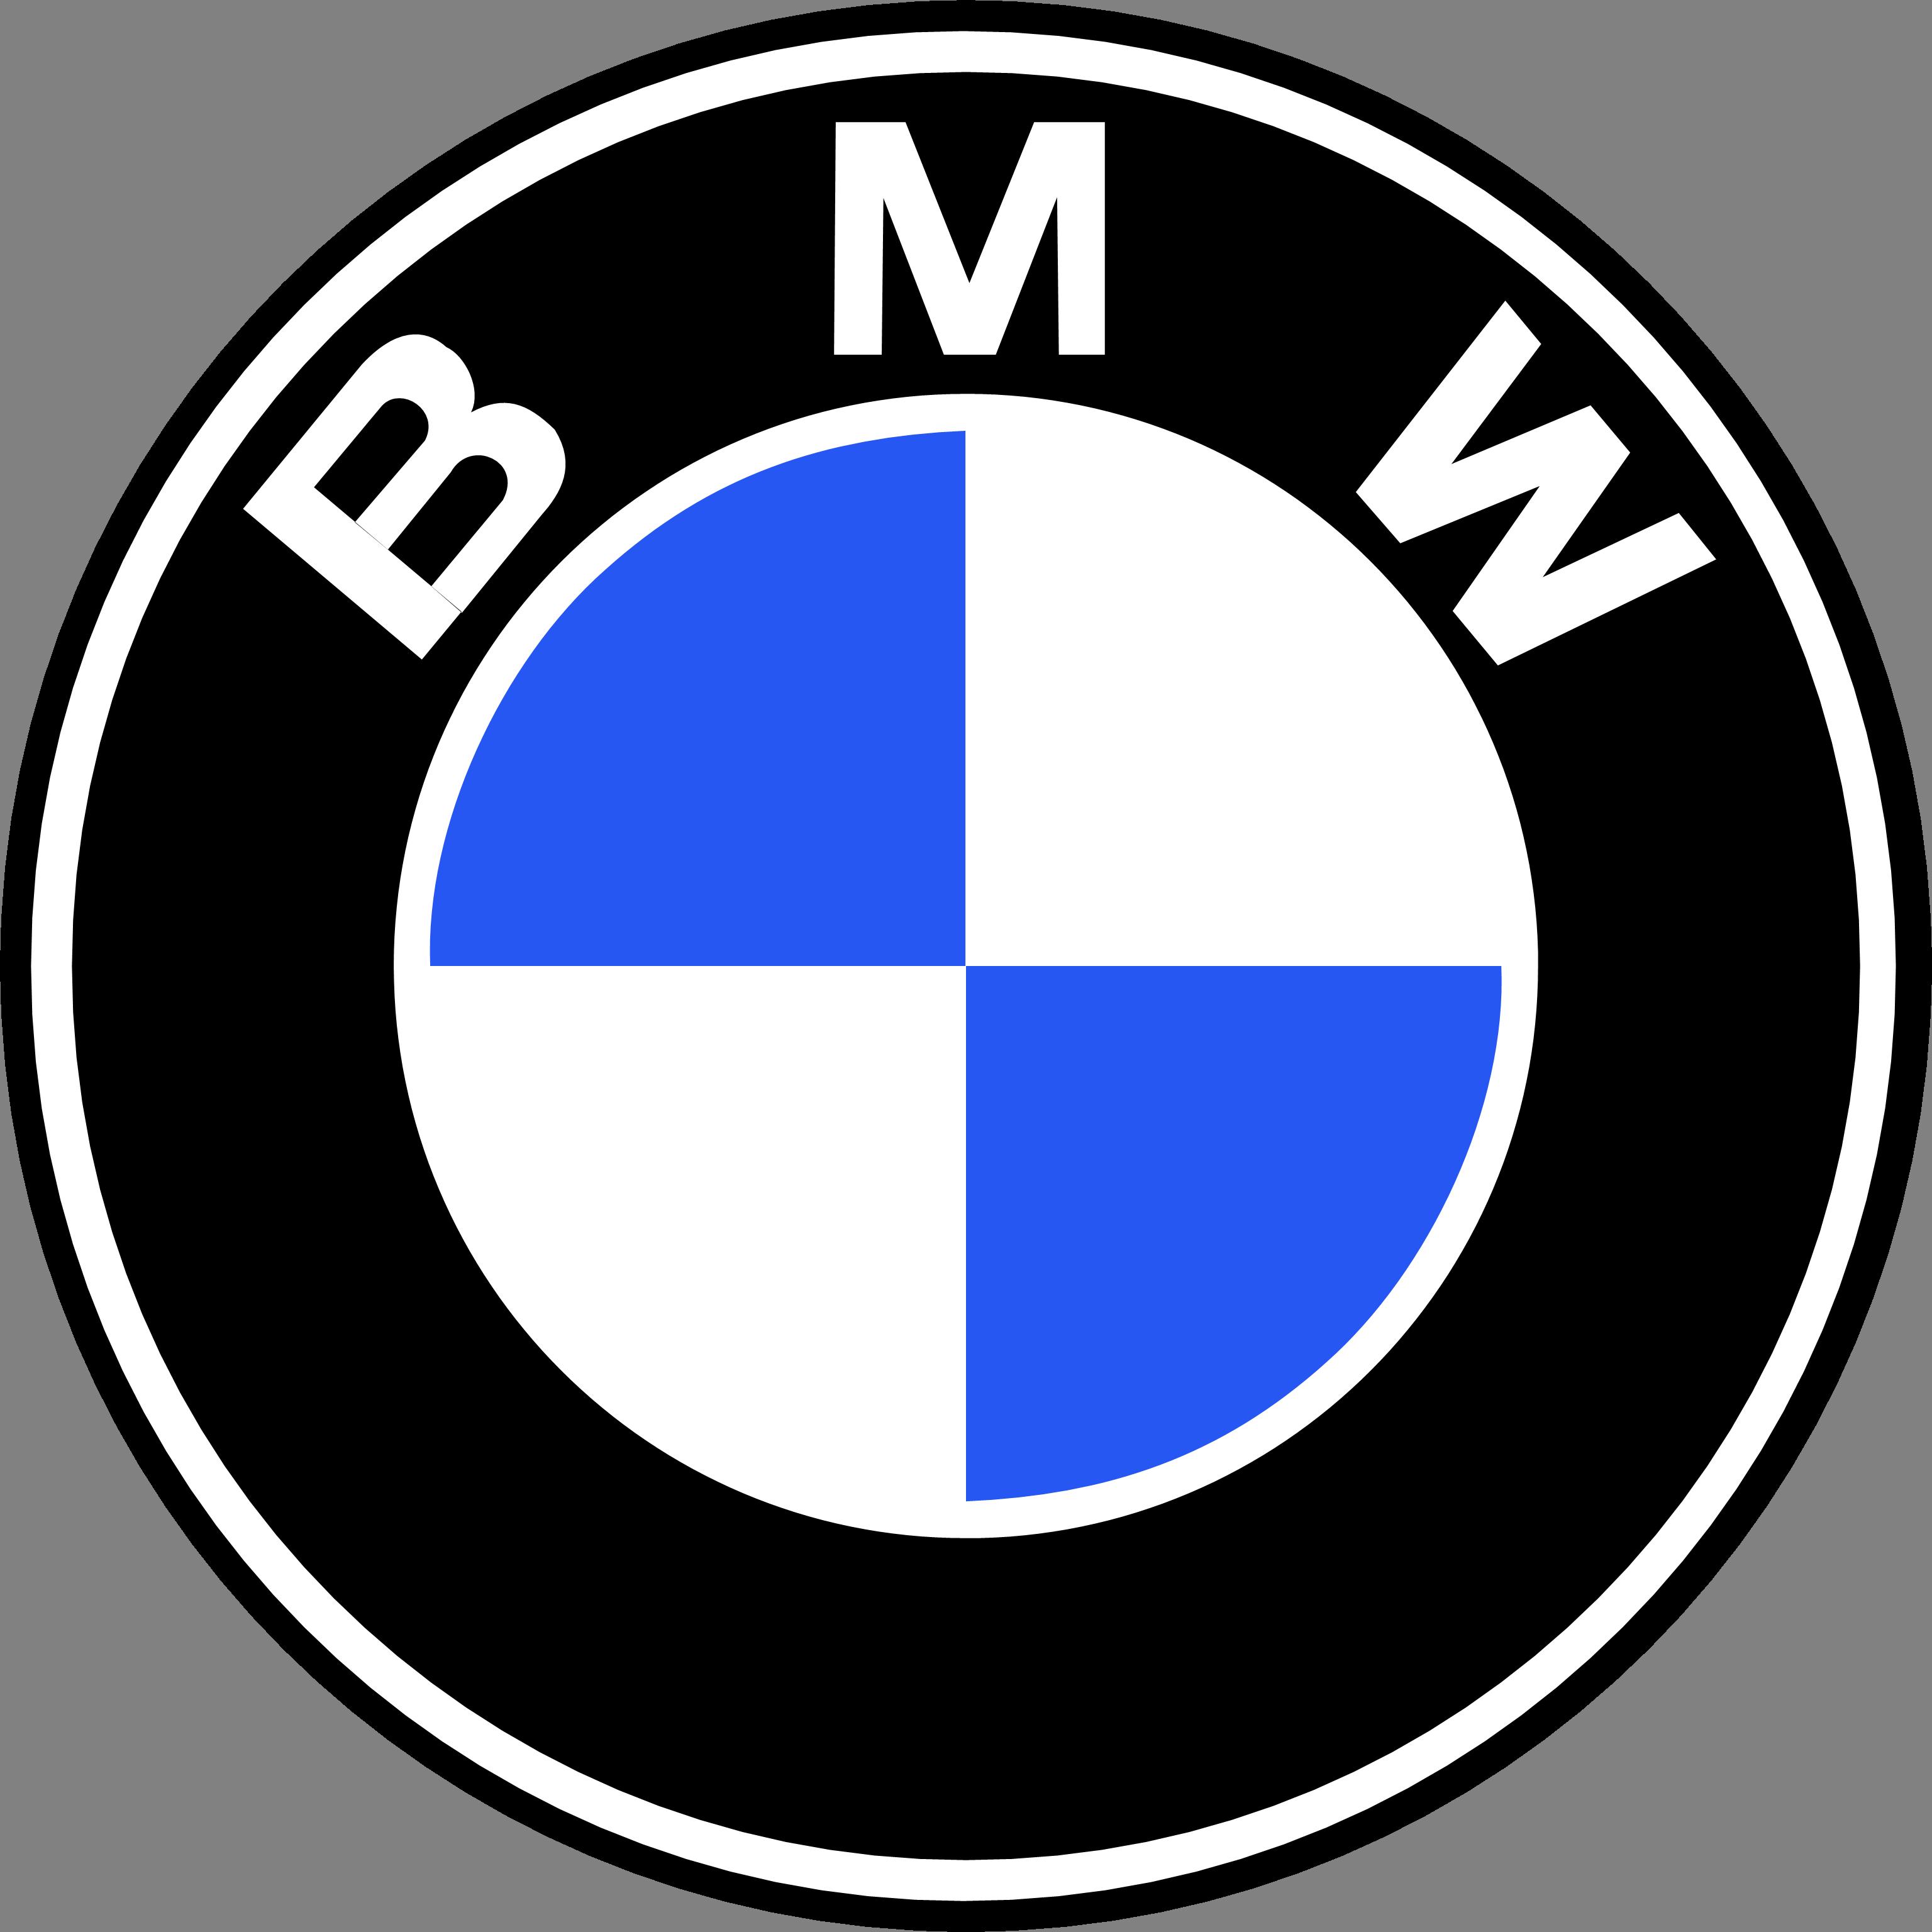 bmw logo Google Search Bmw logo, Bmw symbol